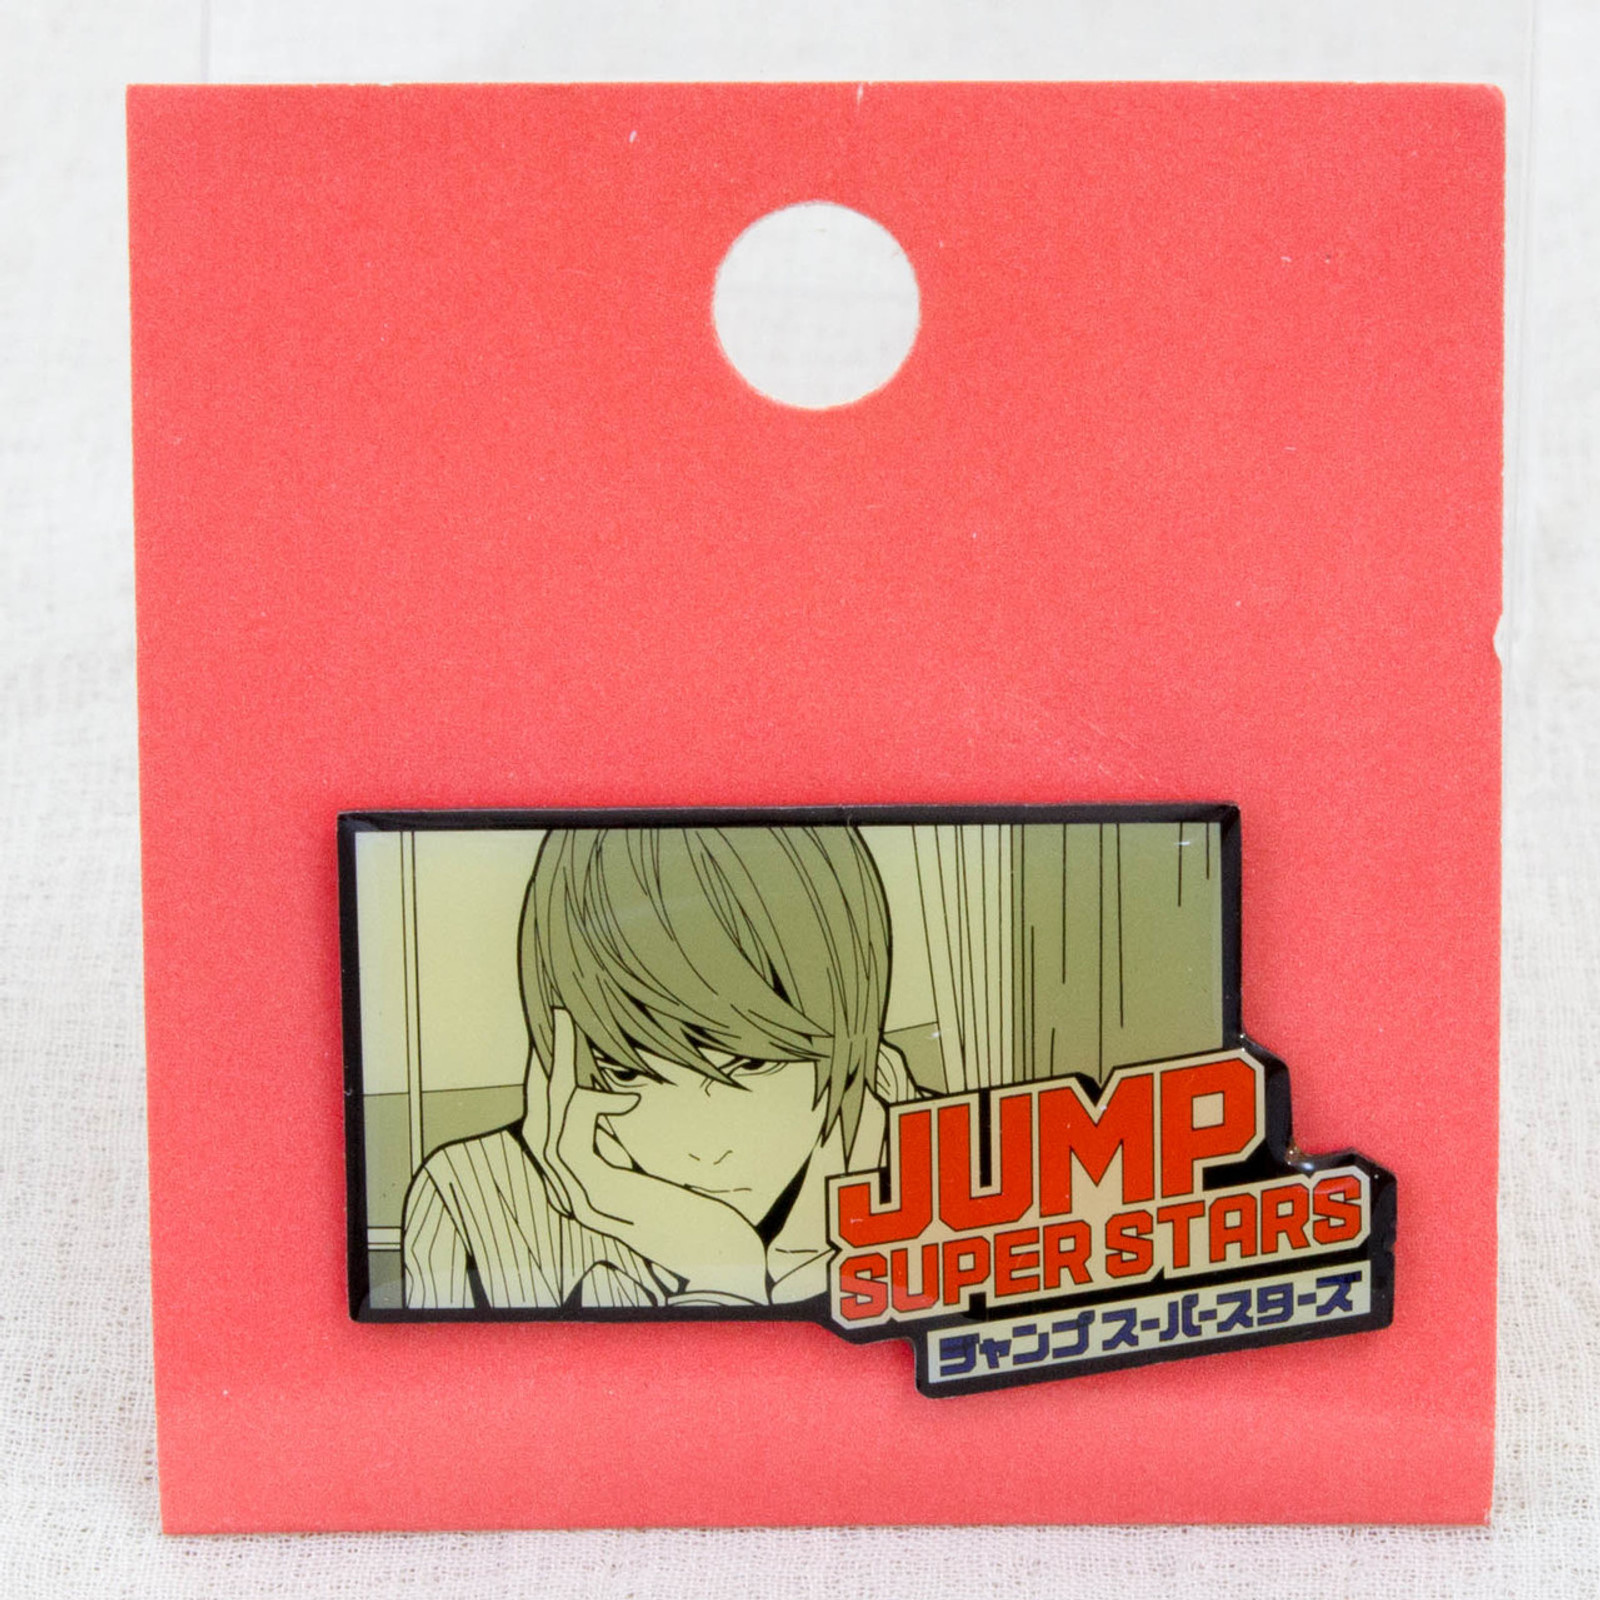 Shonen Jump Super Stars Pins Death Note Light Yagami JAPAN ANIME MANGA